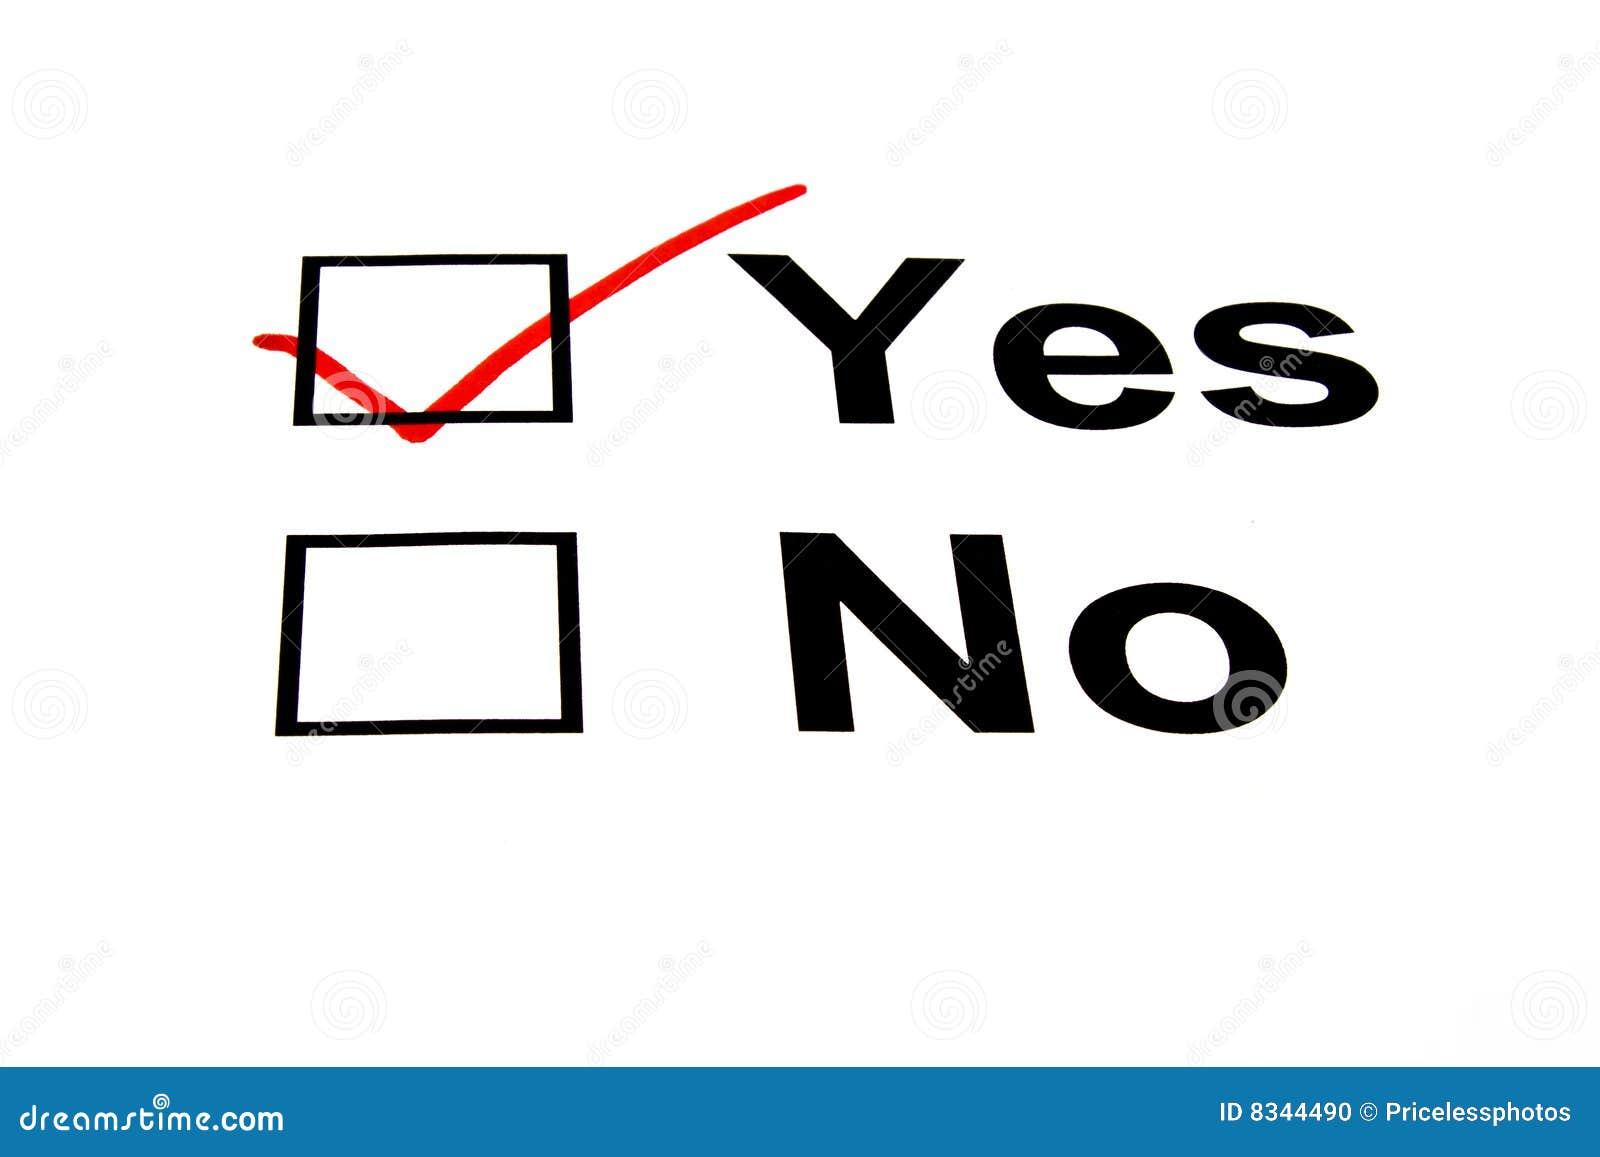 Yes Check Box Stock Images - Image: 17107374 |Check Box Yes